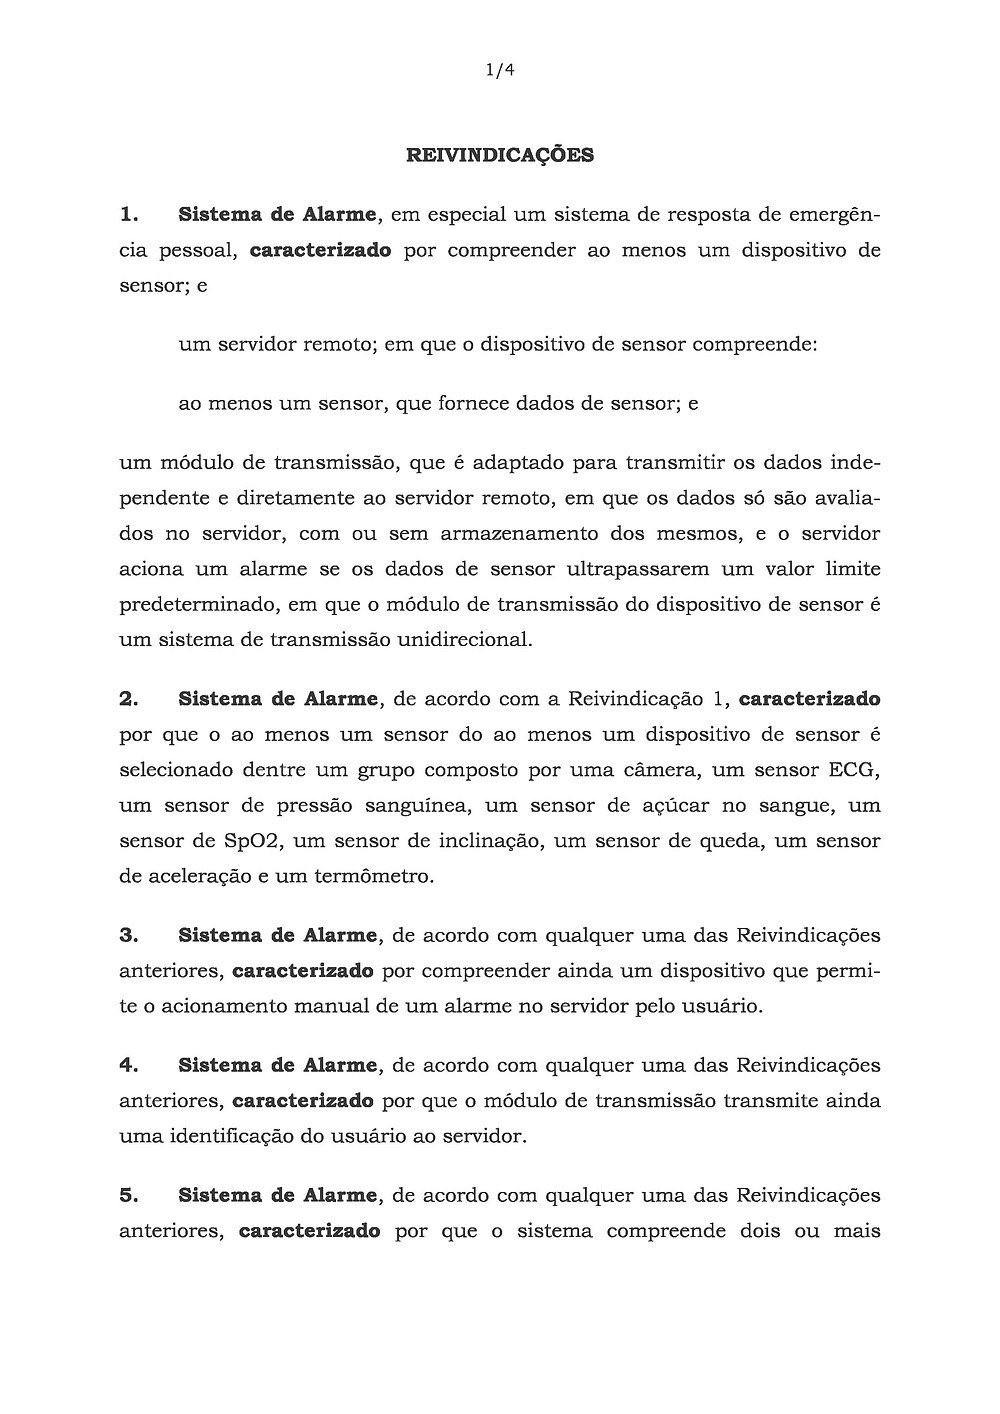 Brasilian patent claims